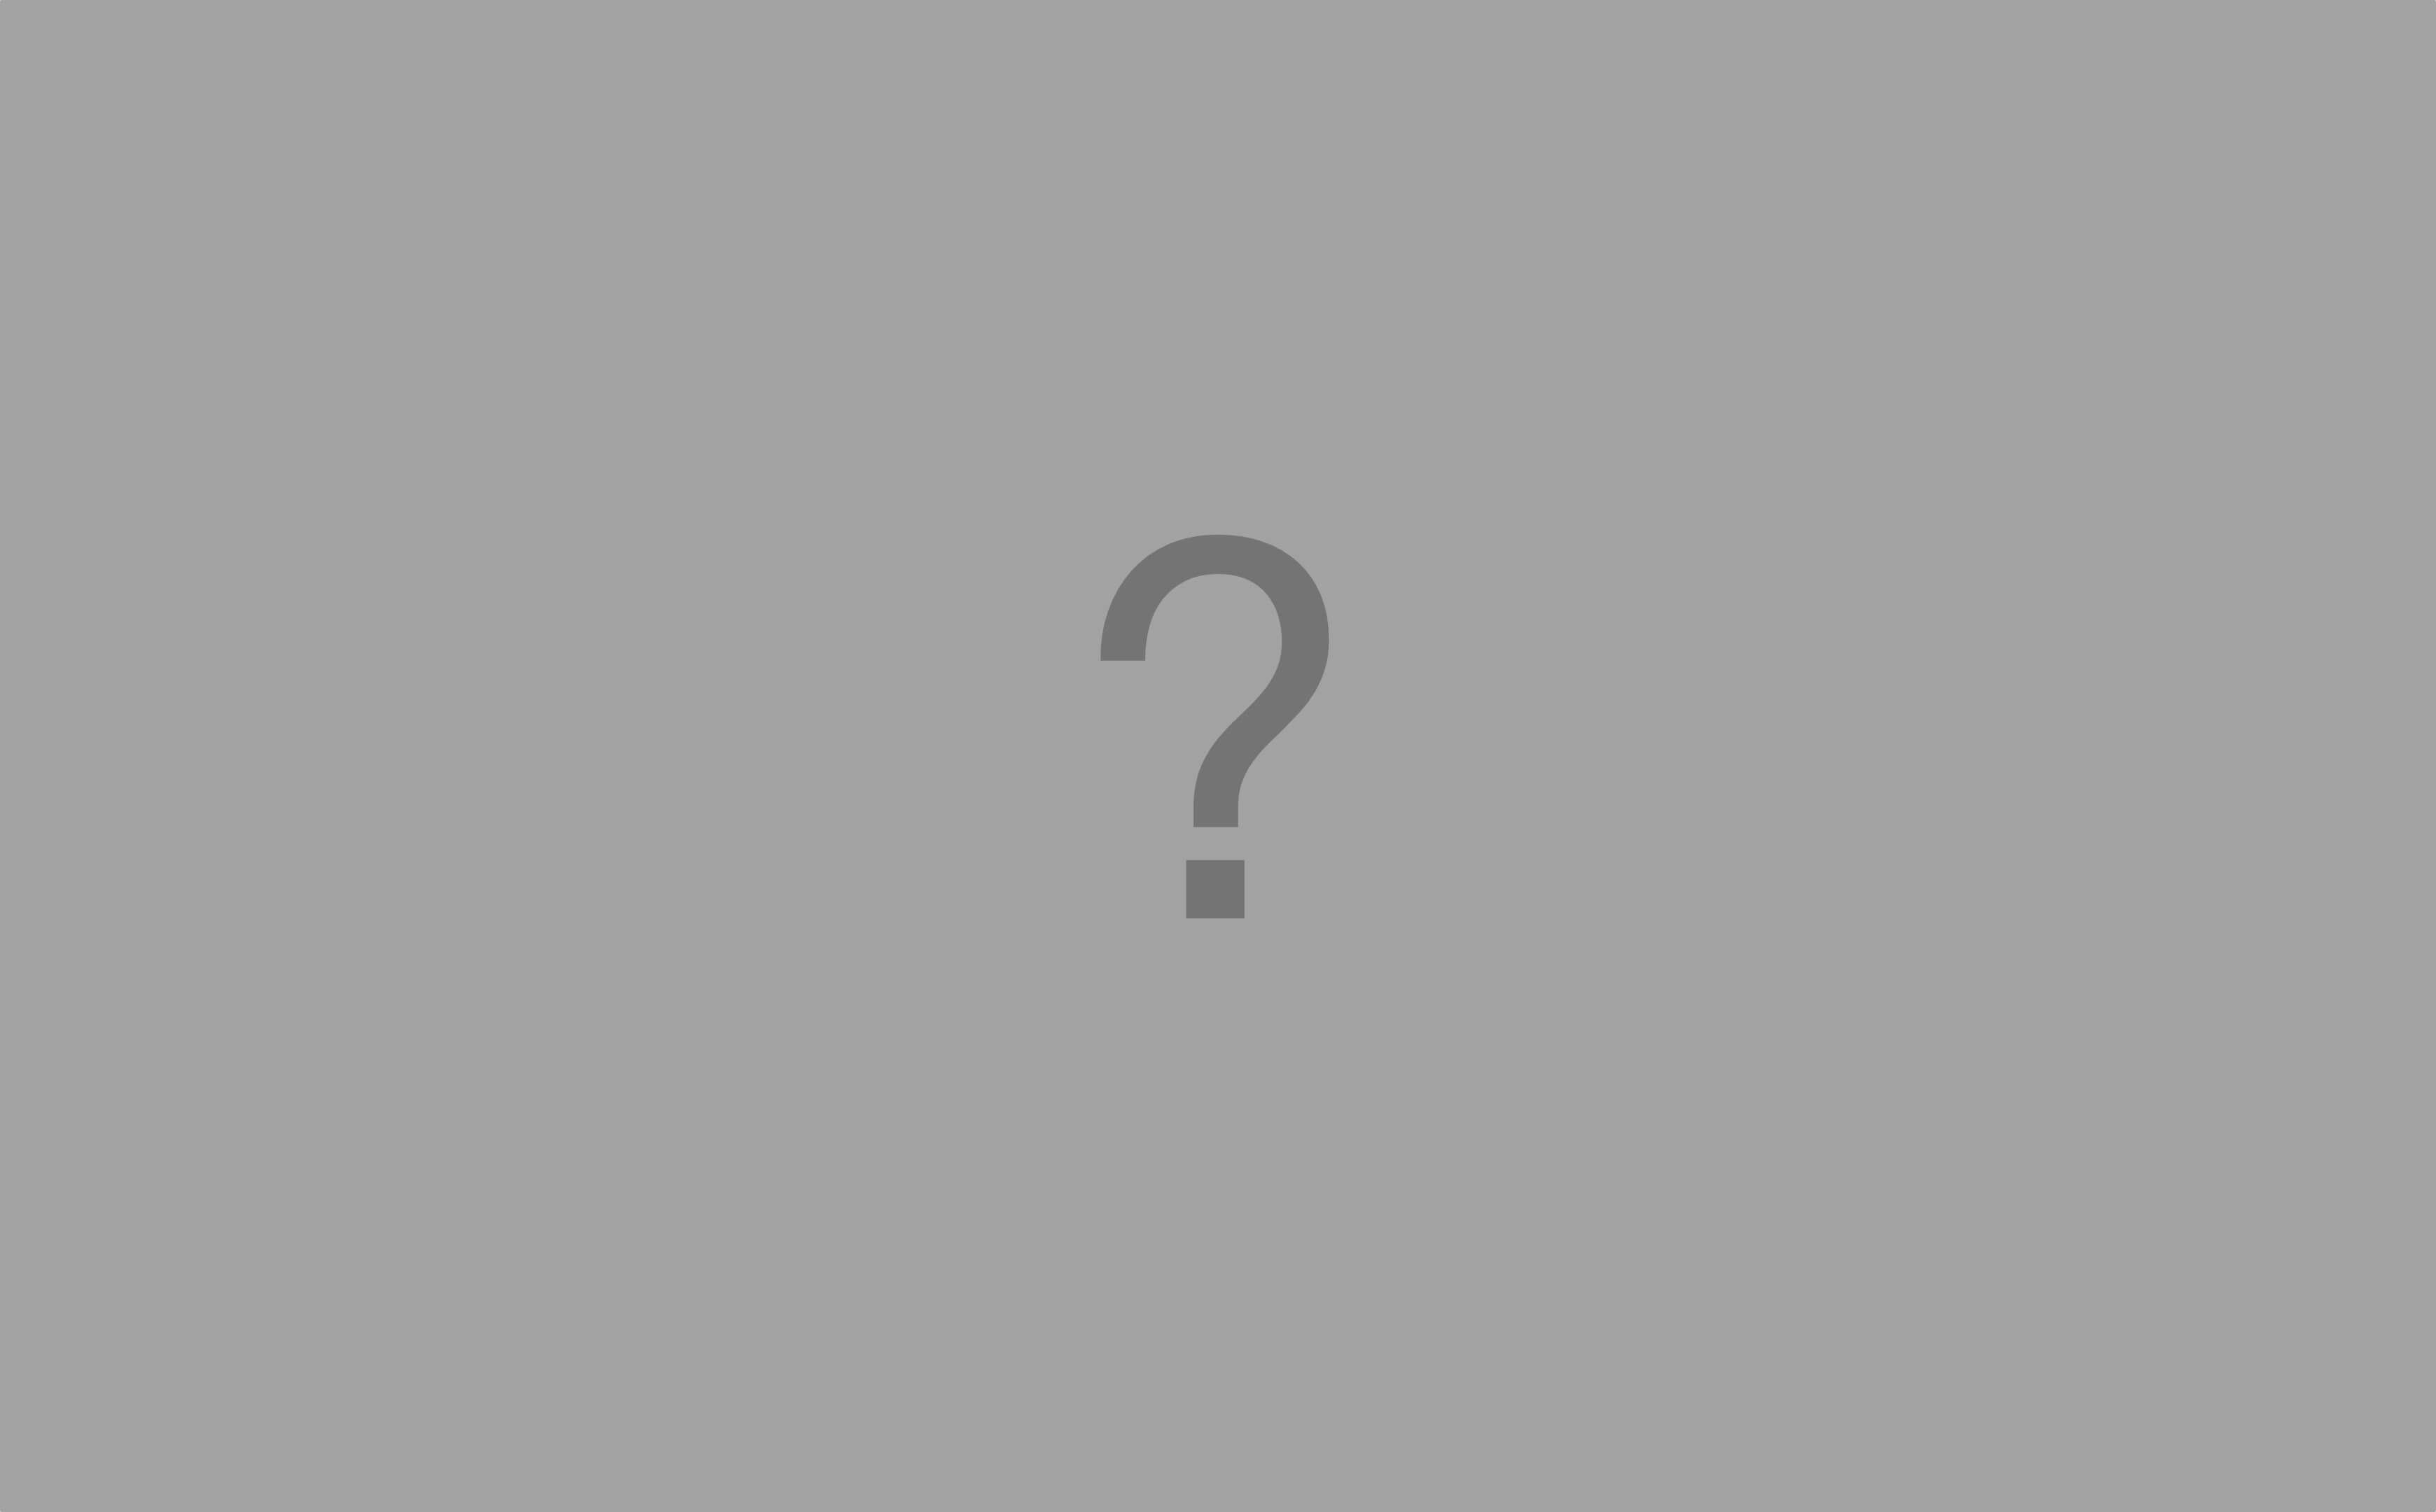 IPhone 8: TouchID-Sensor angeblich unter dem Display